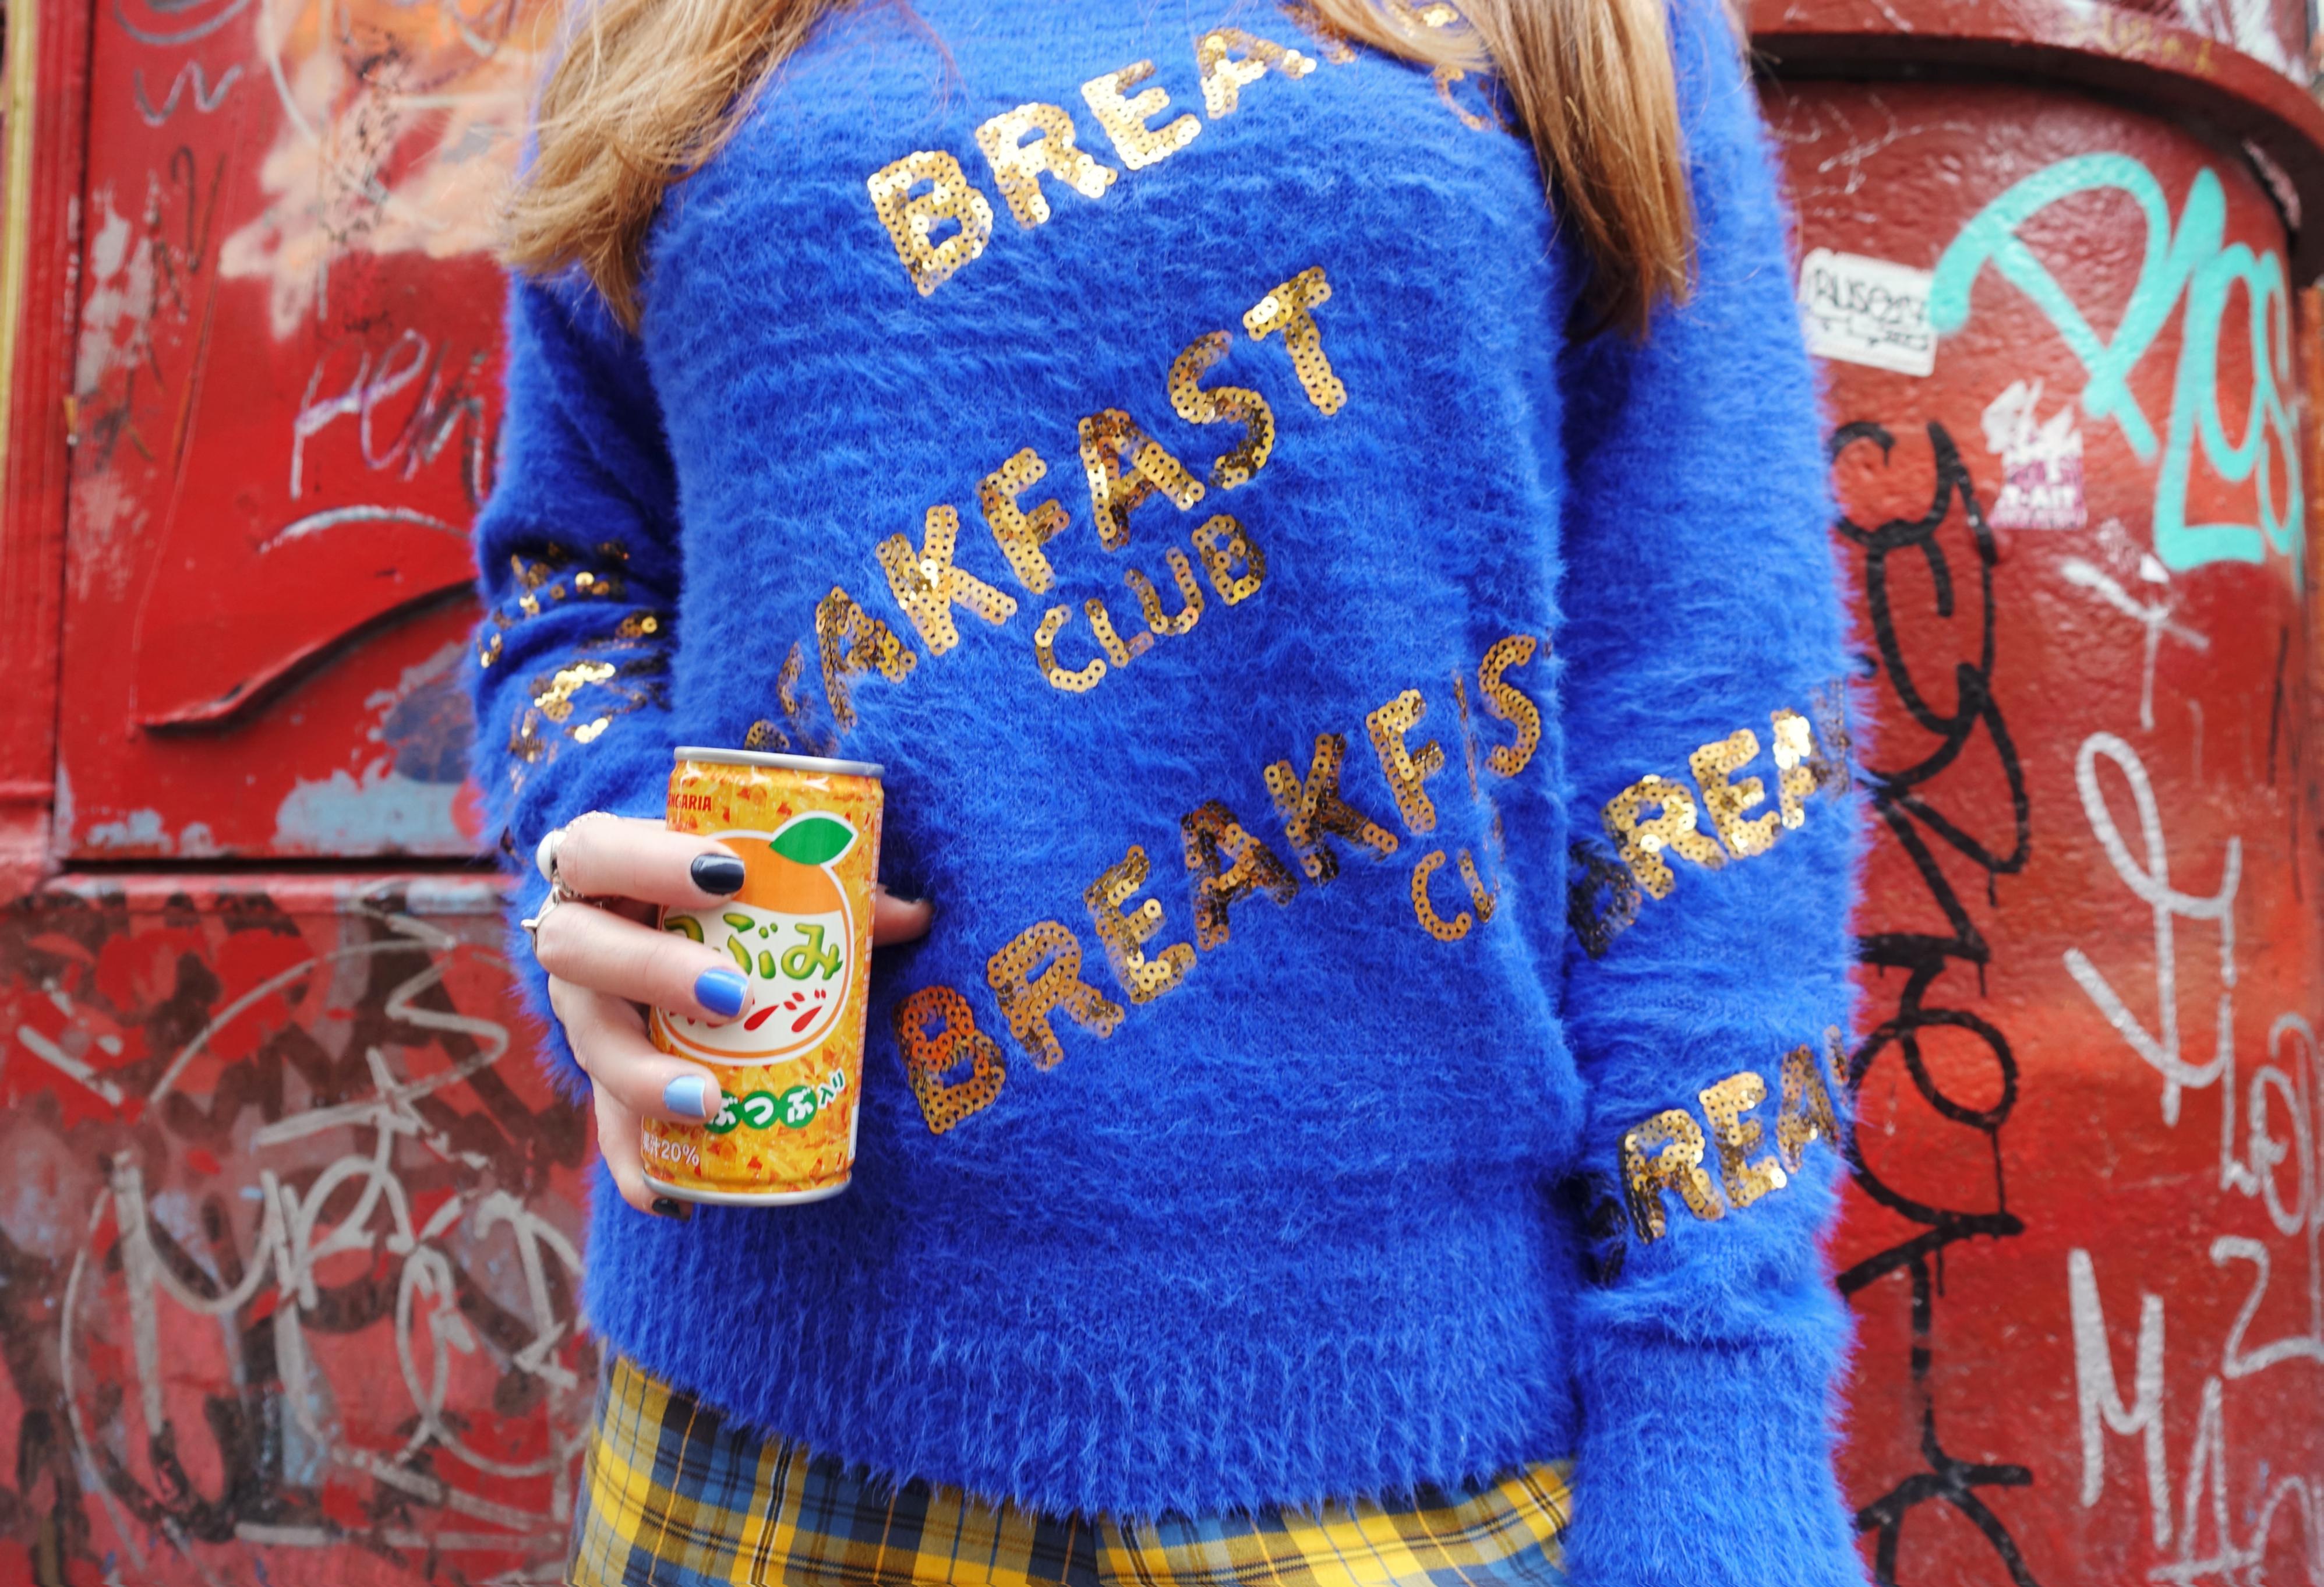 urban-look-Chicadicta-molly-bracken-PiensaenChic-blog-de-moda-fashionista-outfit-azul-fall-style-outfits-con-lentejuelas-Chic-adicta-Piensa-en-Chic